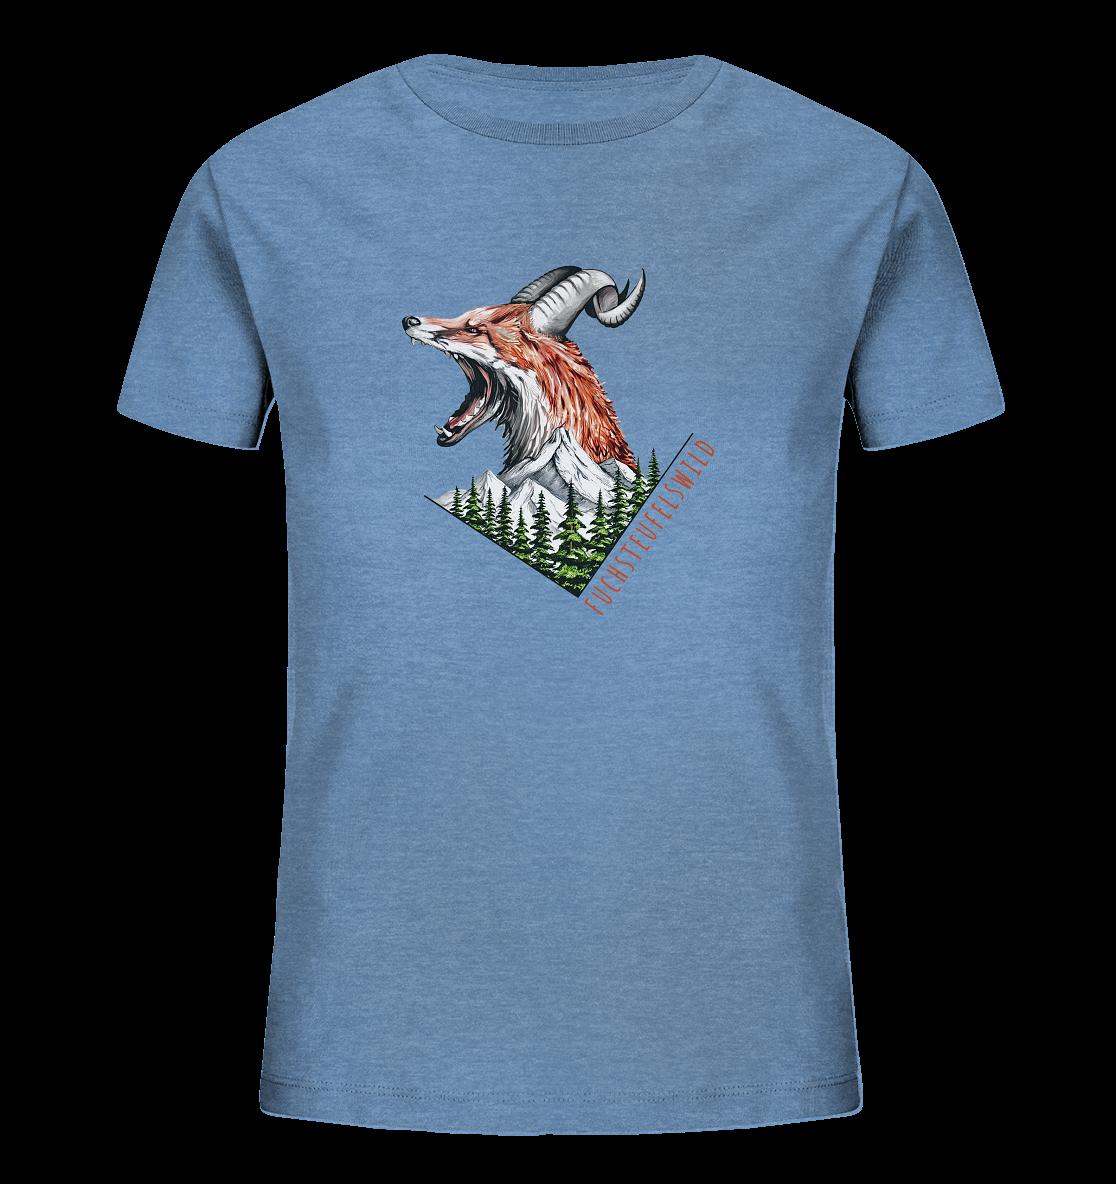 front-kids-organic-shirt-6090c4-1116x-2.png